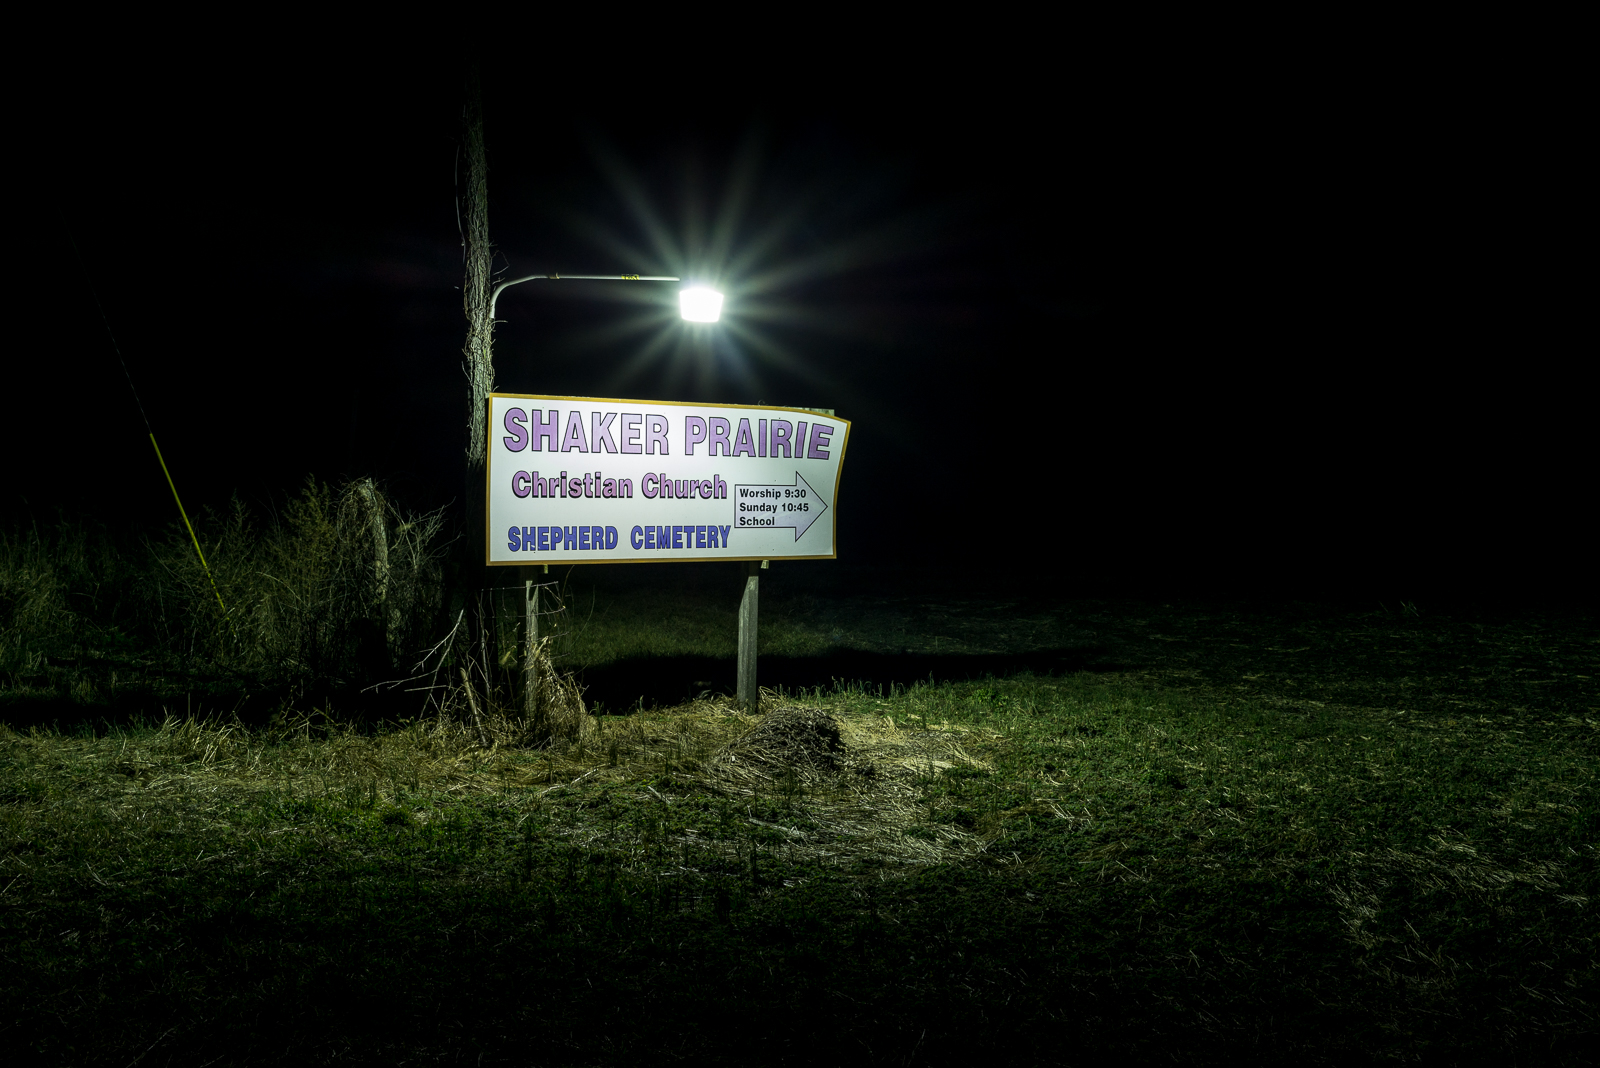 Shaker Prairie Christian Church Shepherd Cemetery, Carlisle, Indiana, 2017